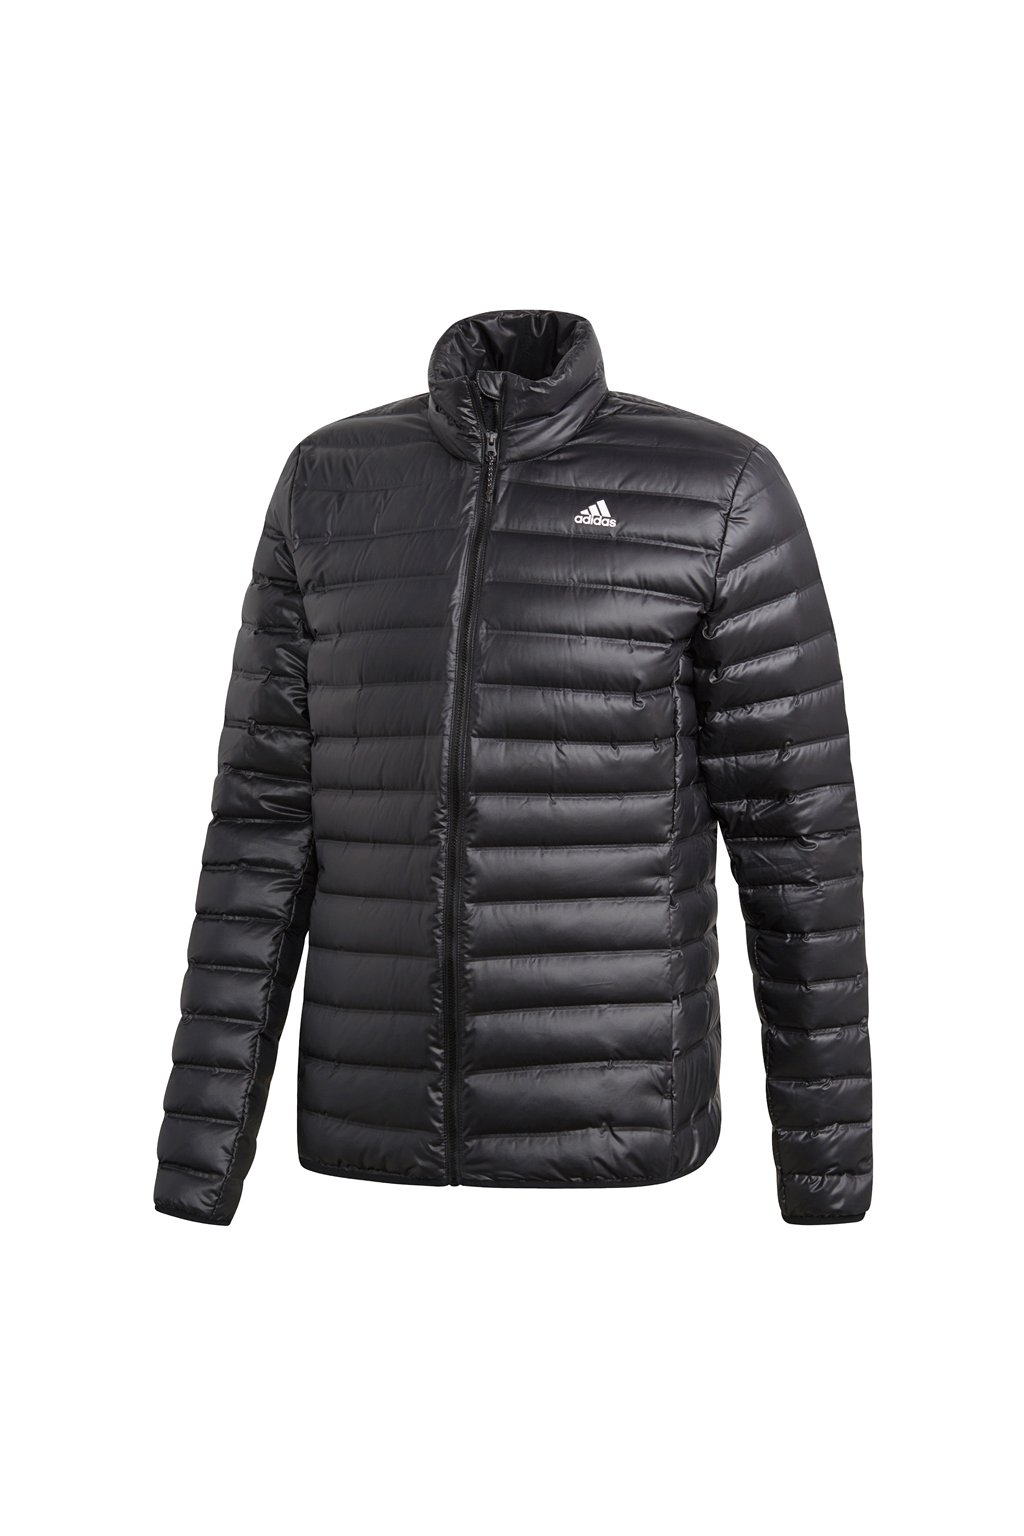 Pánska bunda Adidas Varilite čierna BS1588